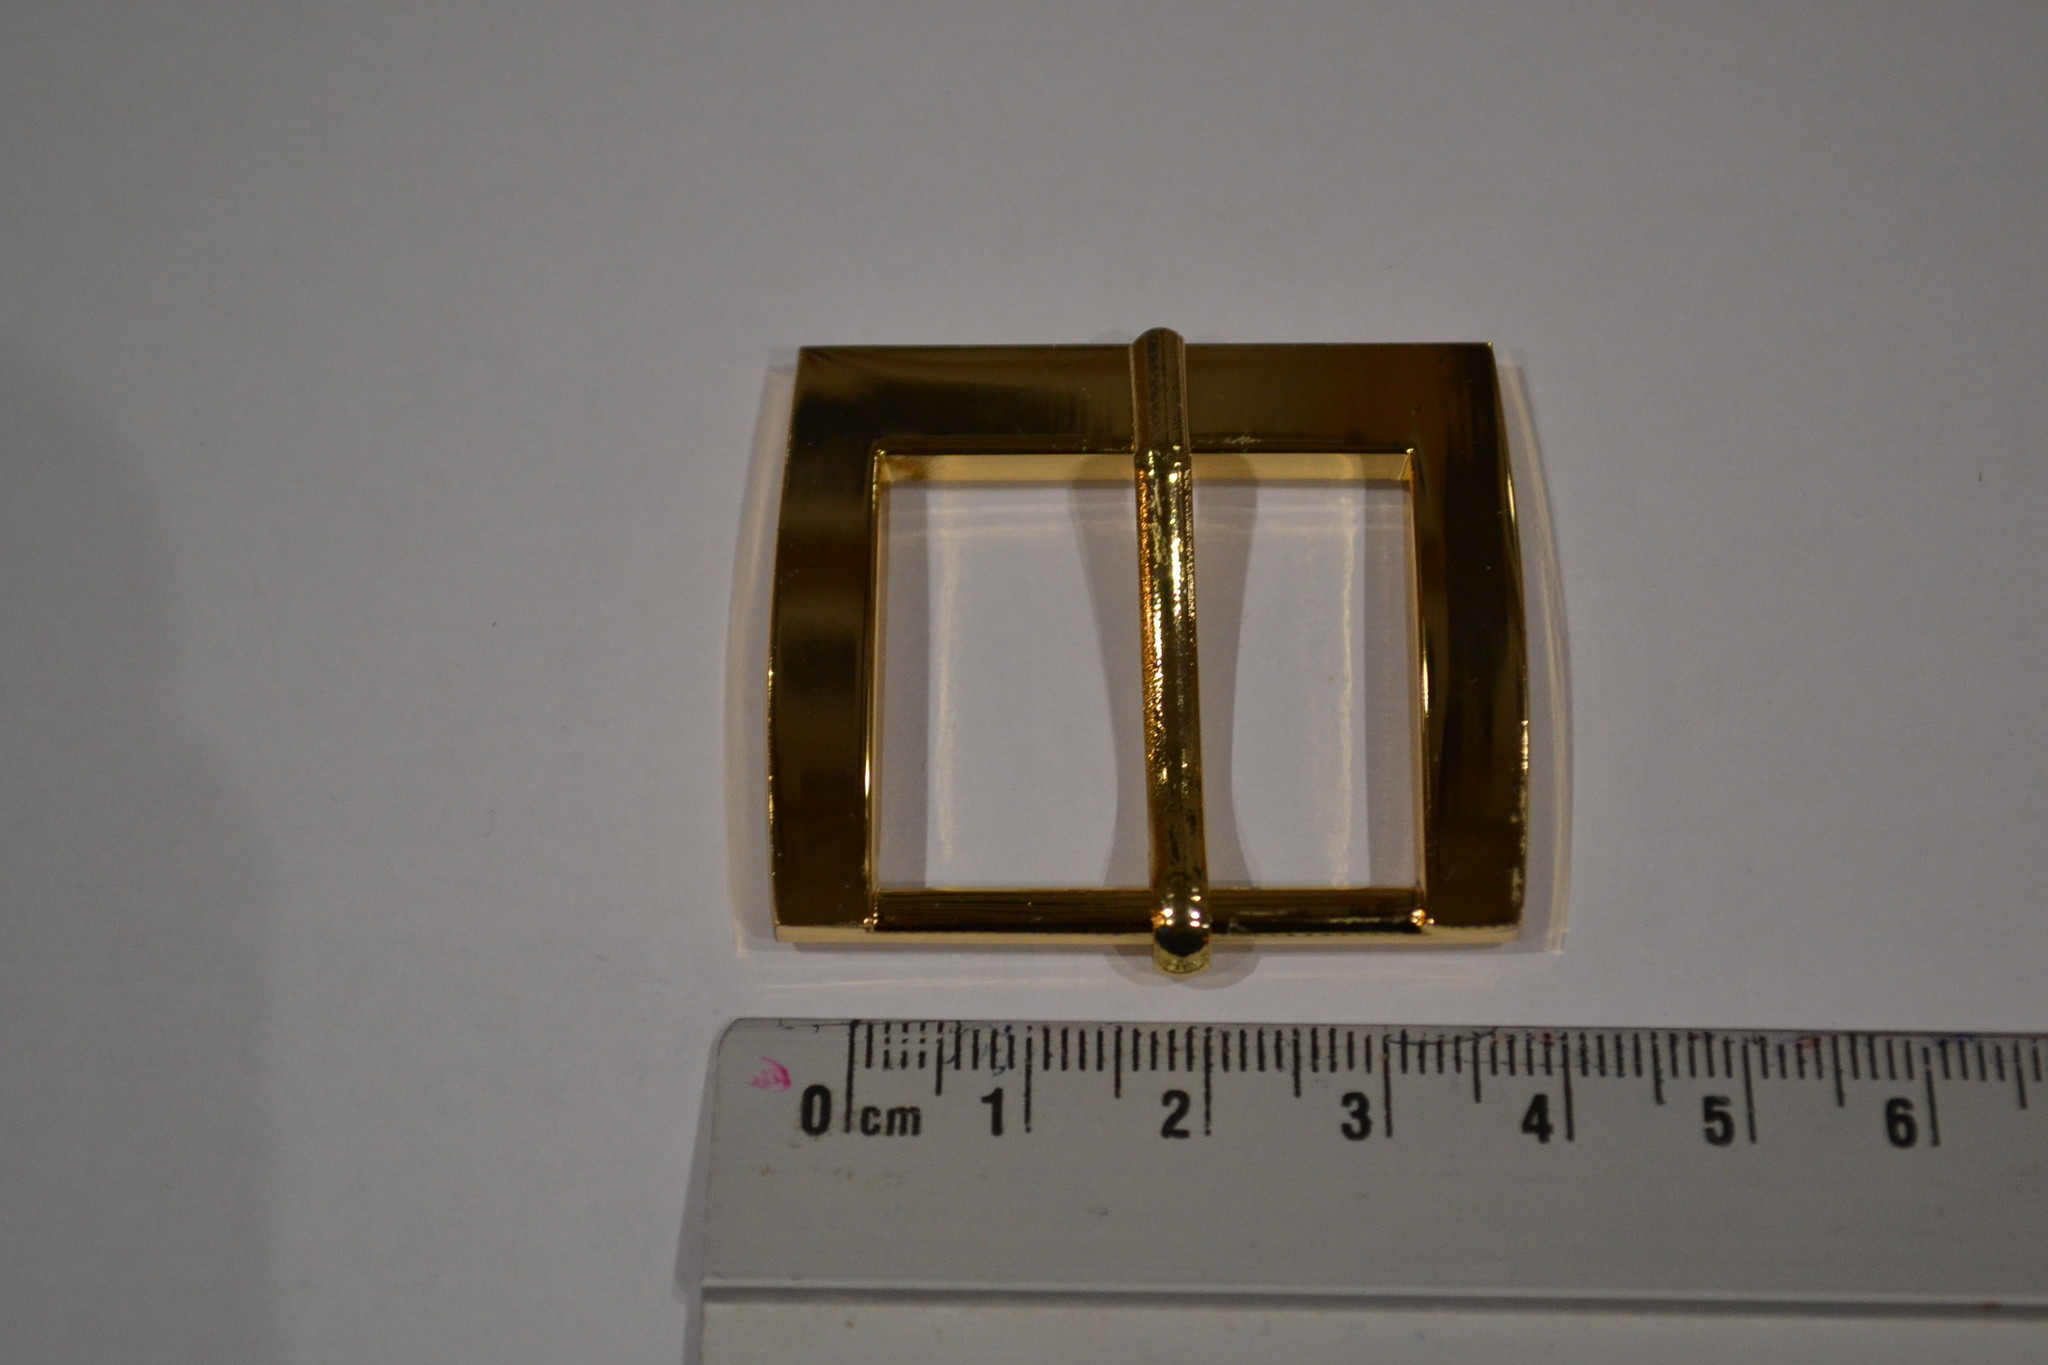 BU45 Gesp goud 30mm